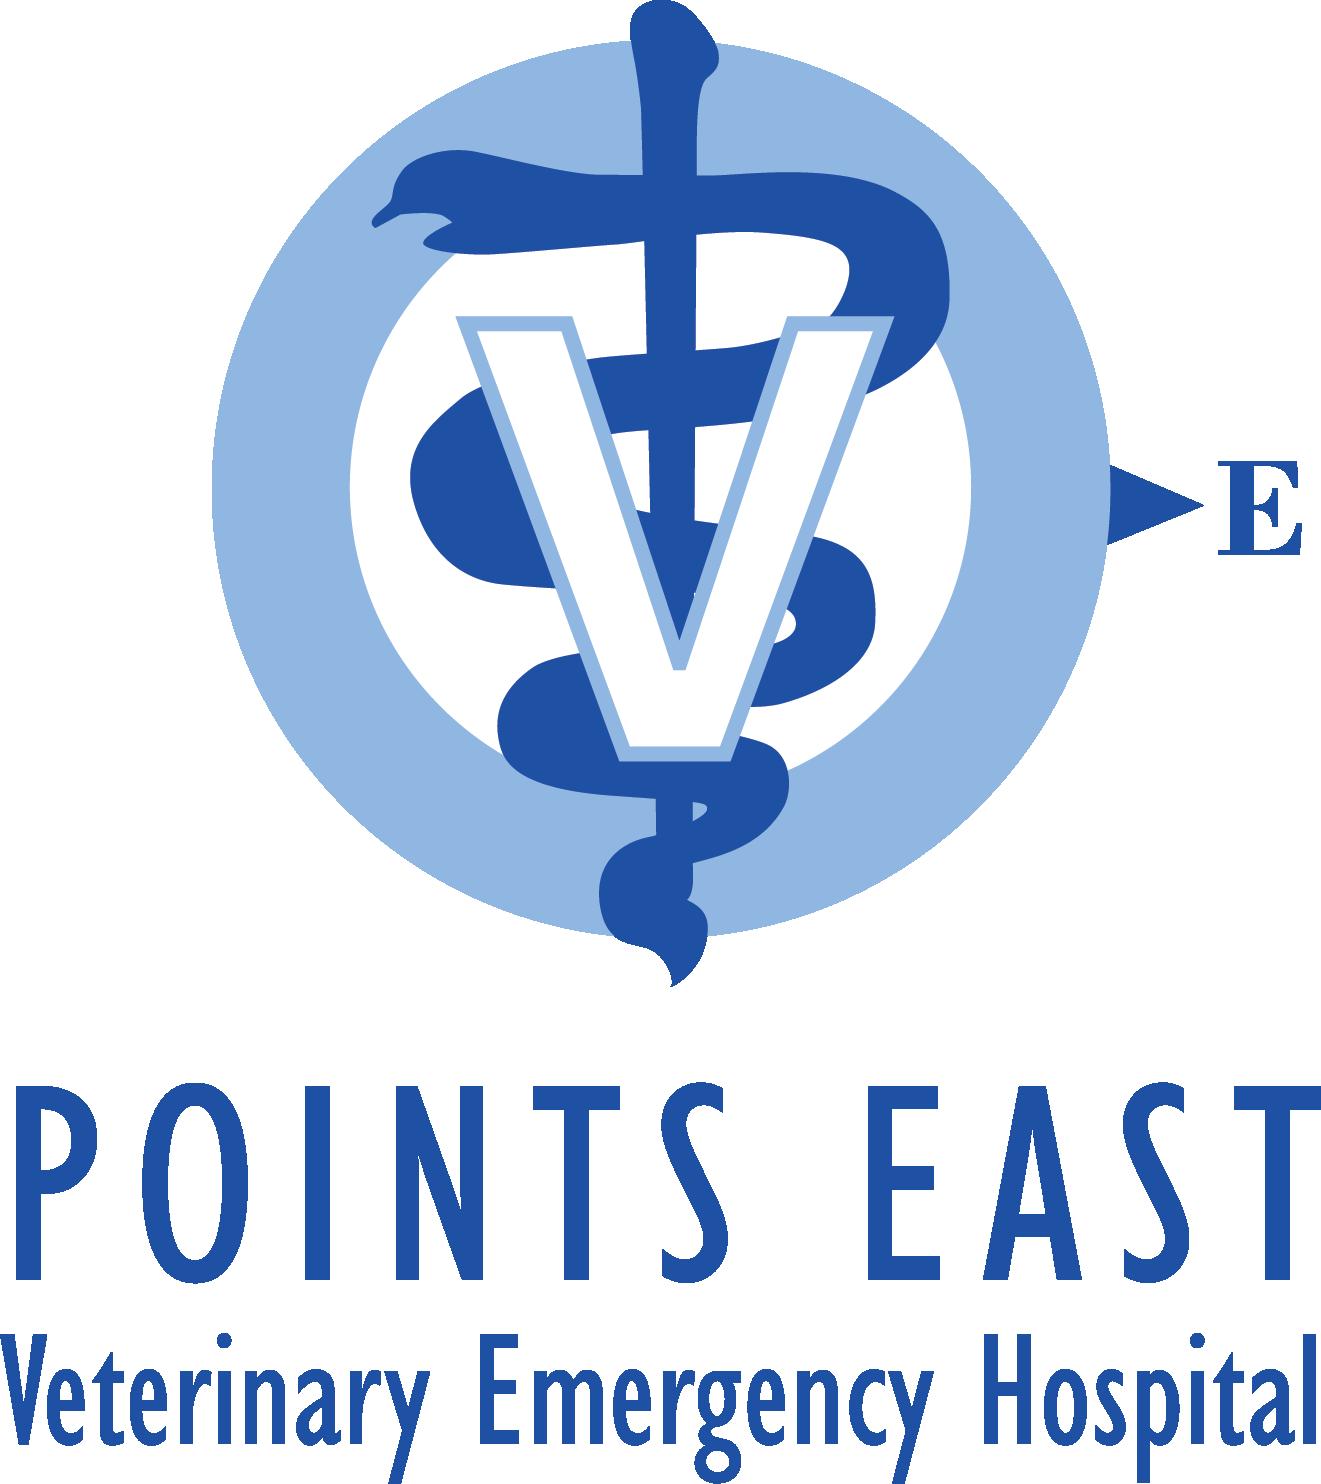 Points East Veterinary Emergency Hospital